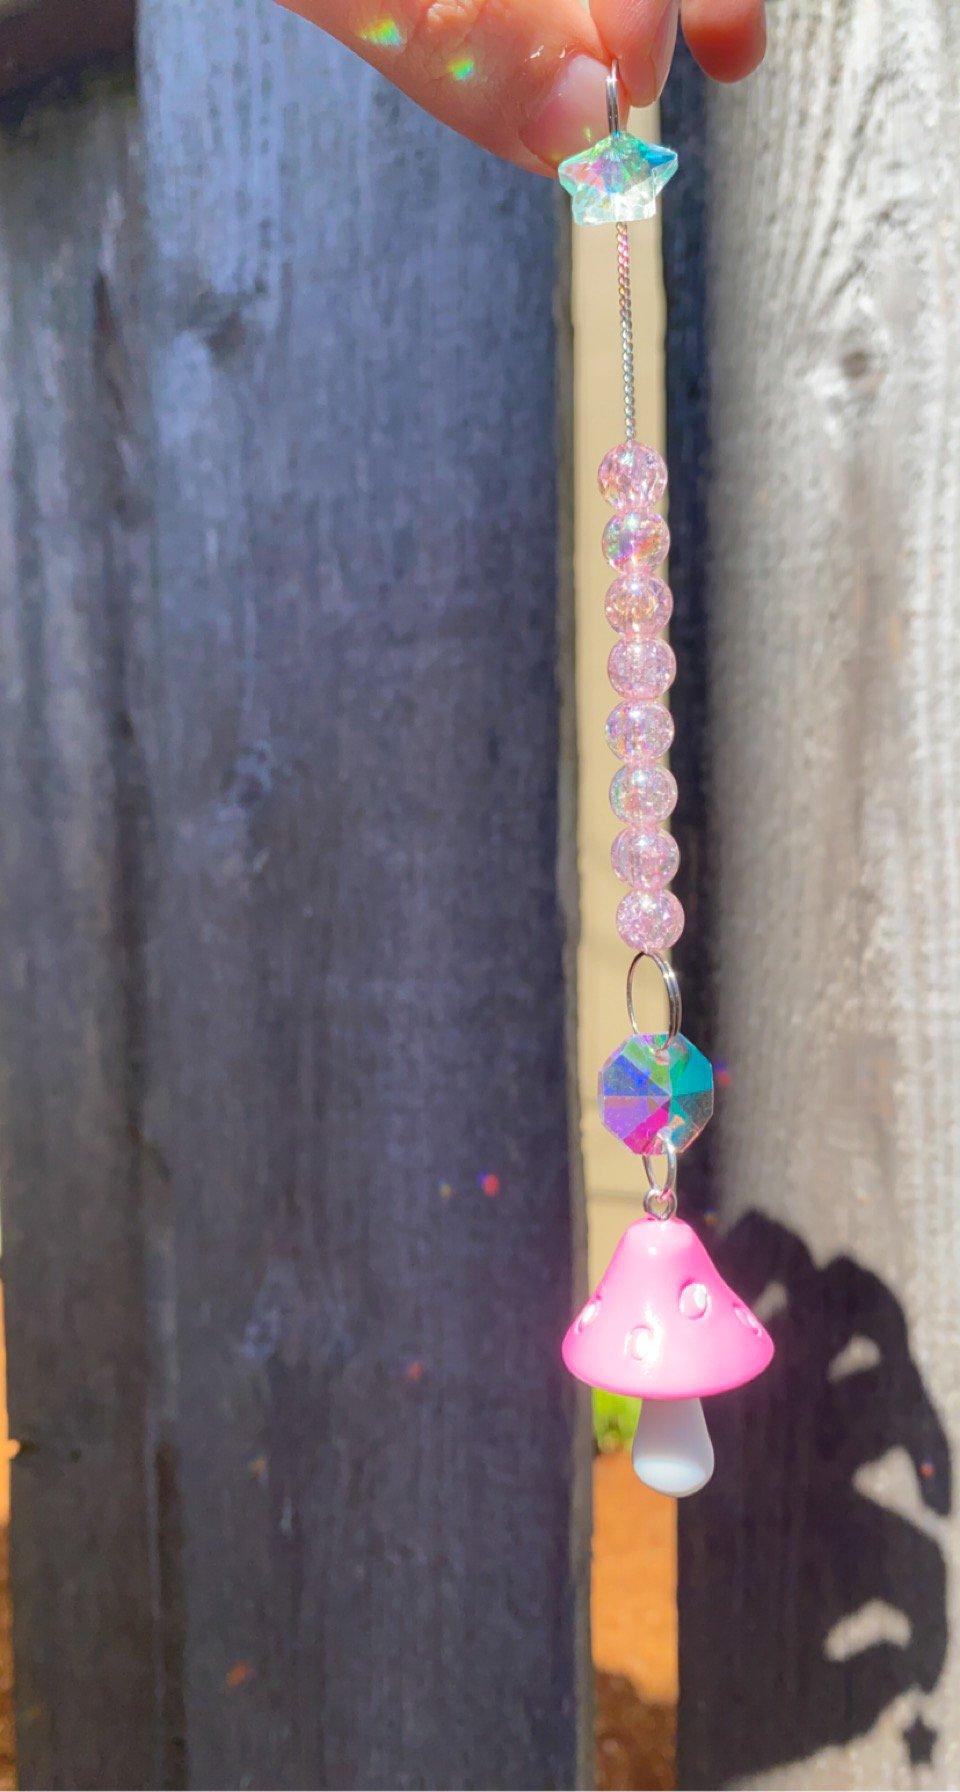 Image of pink mushroom hanging decor 🌞🌈✨